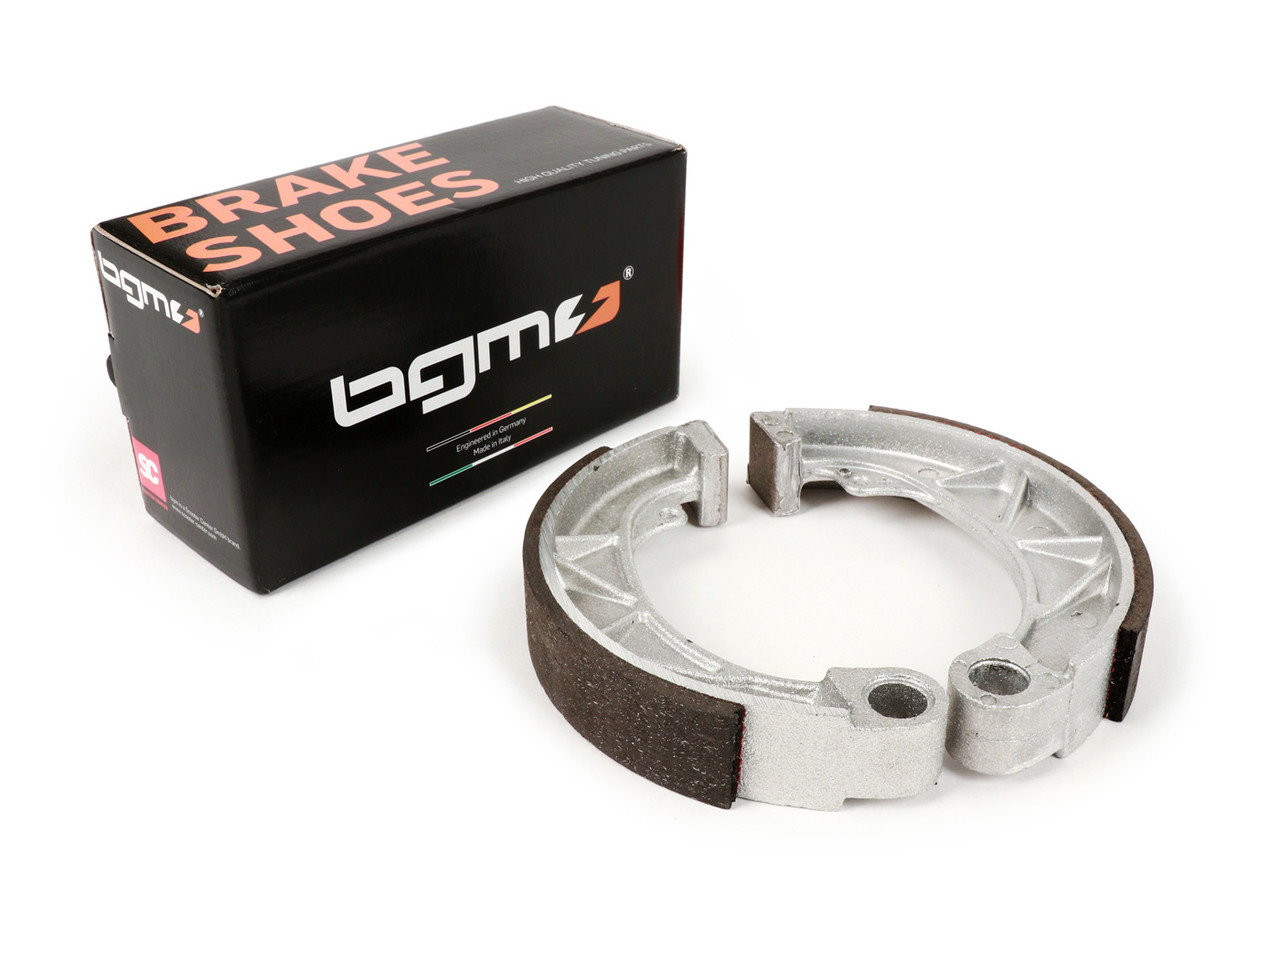 Lambretta Brake Shoe Performance BGM Pro LI/SX/TV (BW-BGM5330)